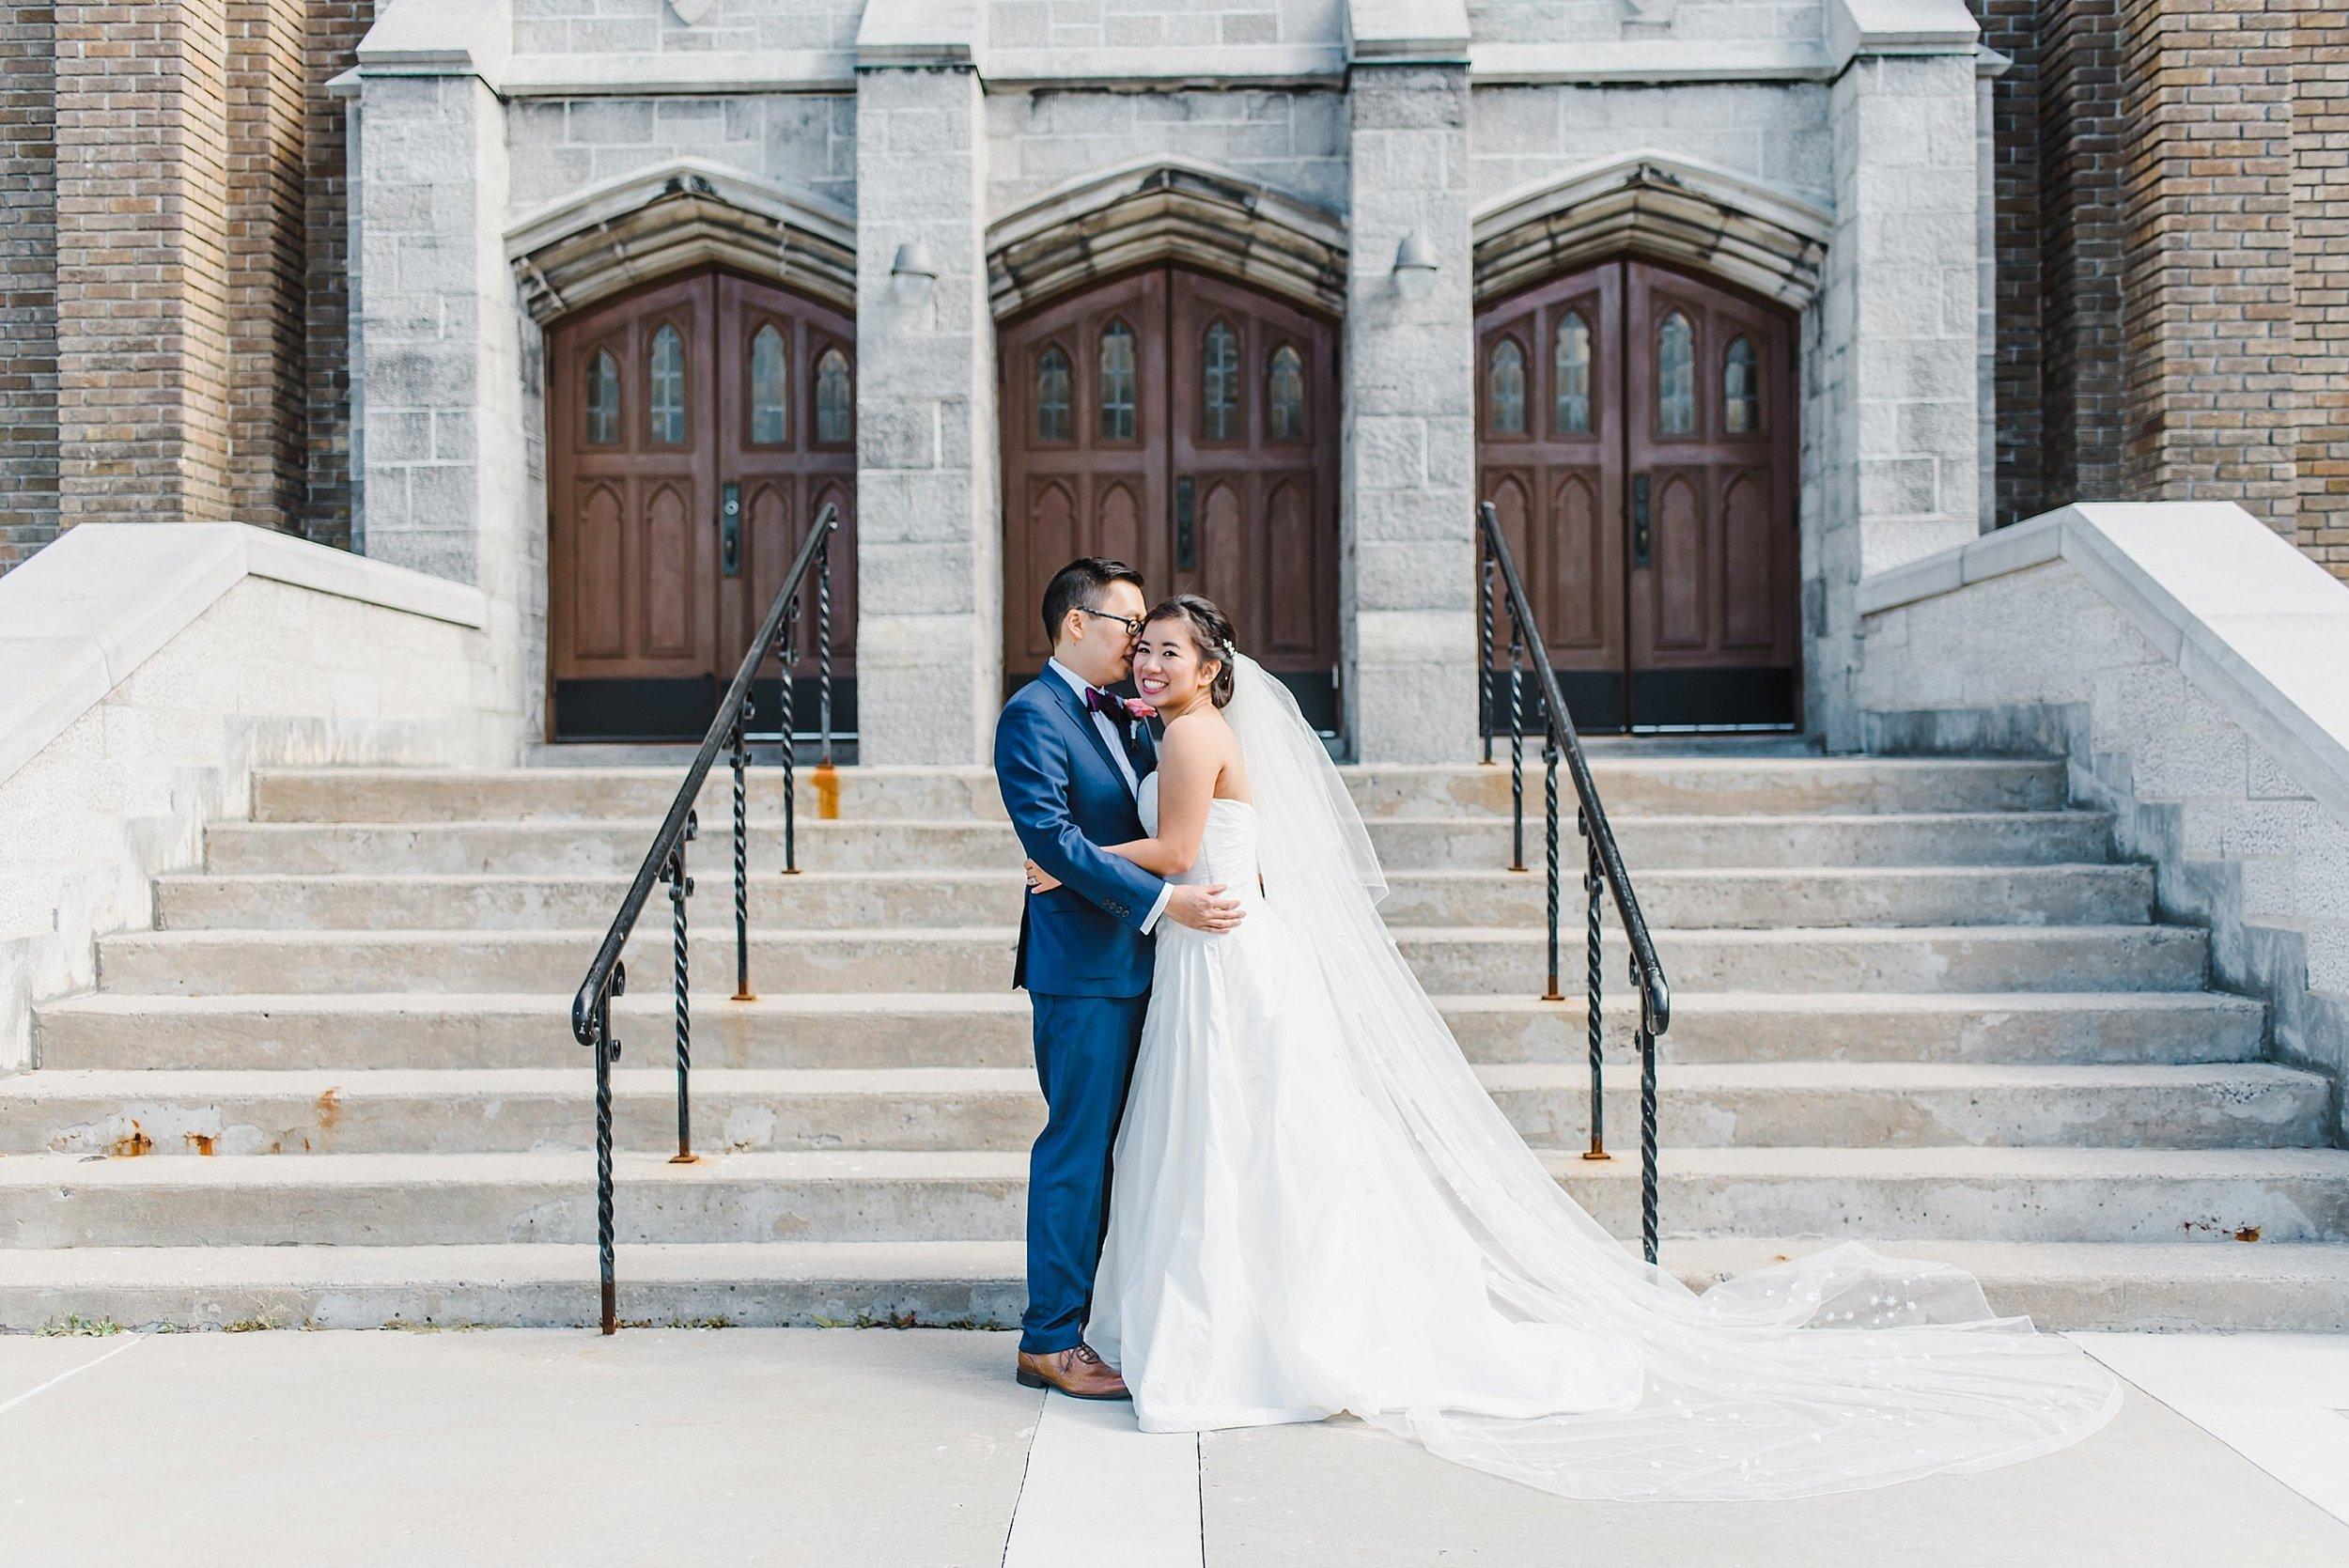 light airy indie fine art ottawa wedding photographer | Ali and Batoul Photography_1496.jpg